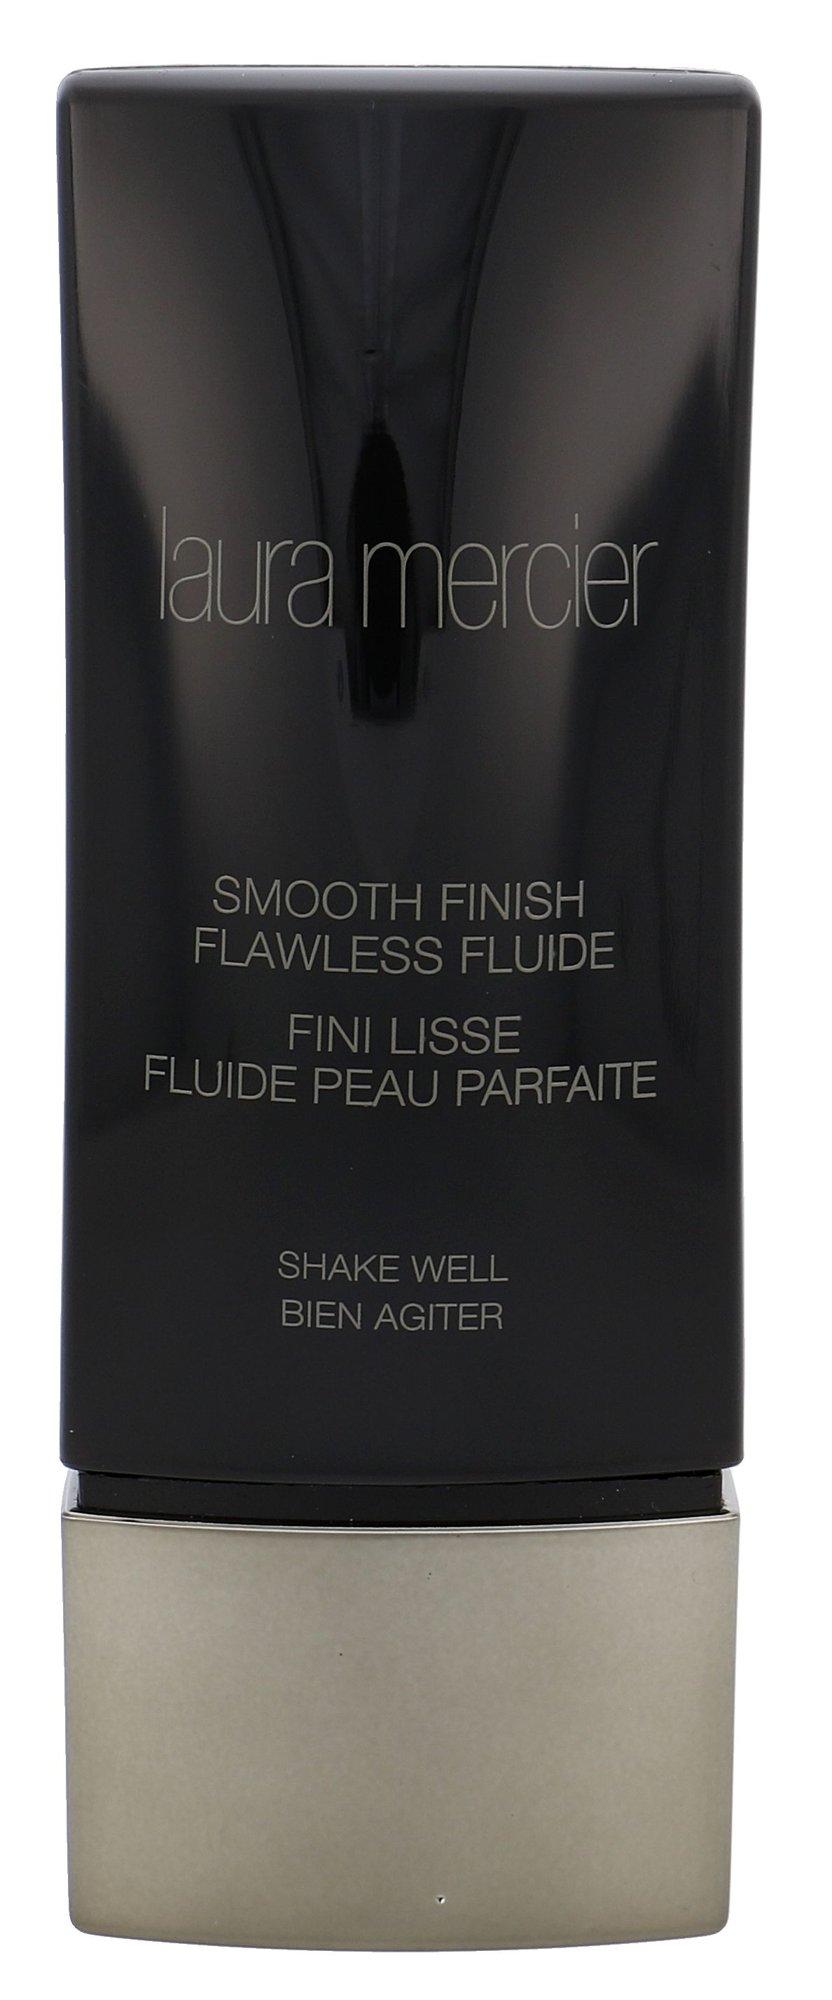 Laura Mercier Smooth Finish Flawless Fluide Cosmetic 30ml Macadamia